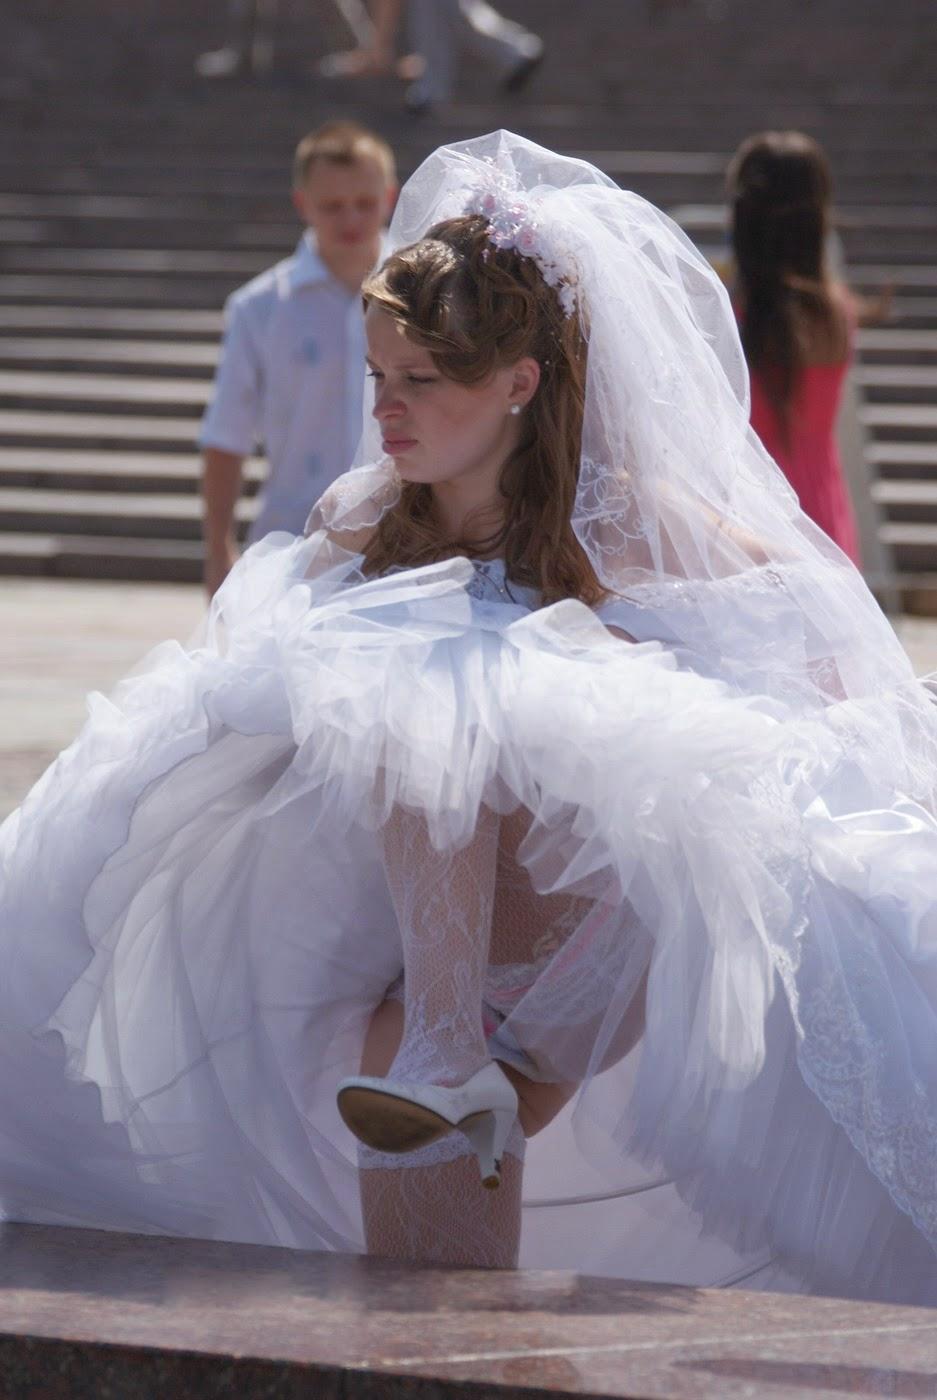 Фото на улице задница в прозрачном платье нас можете